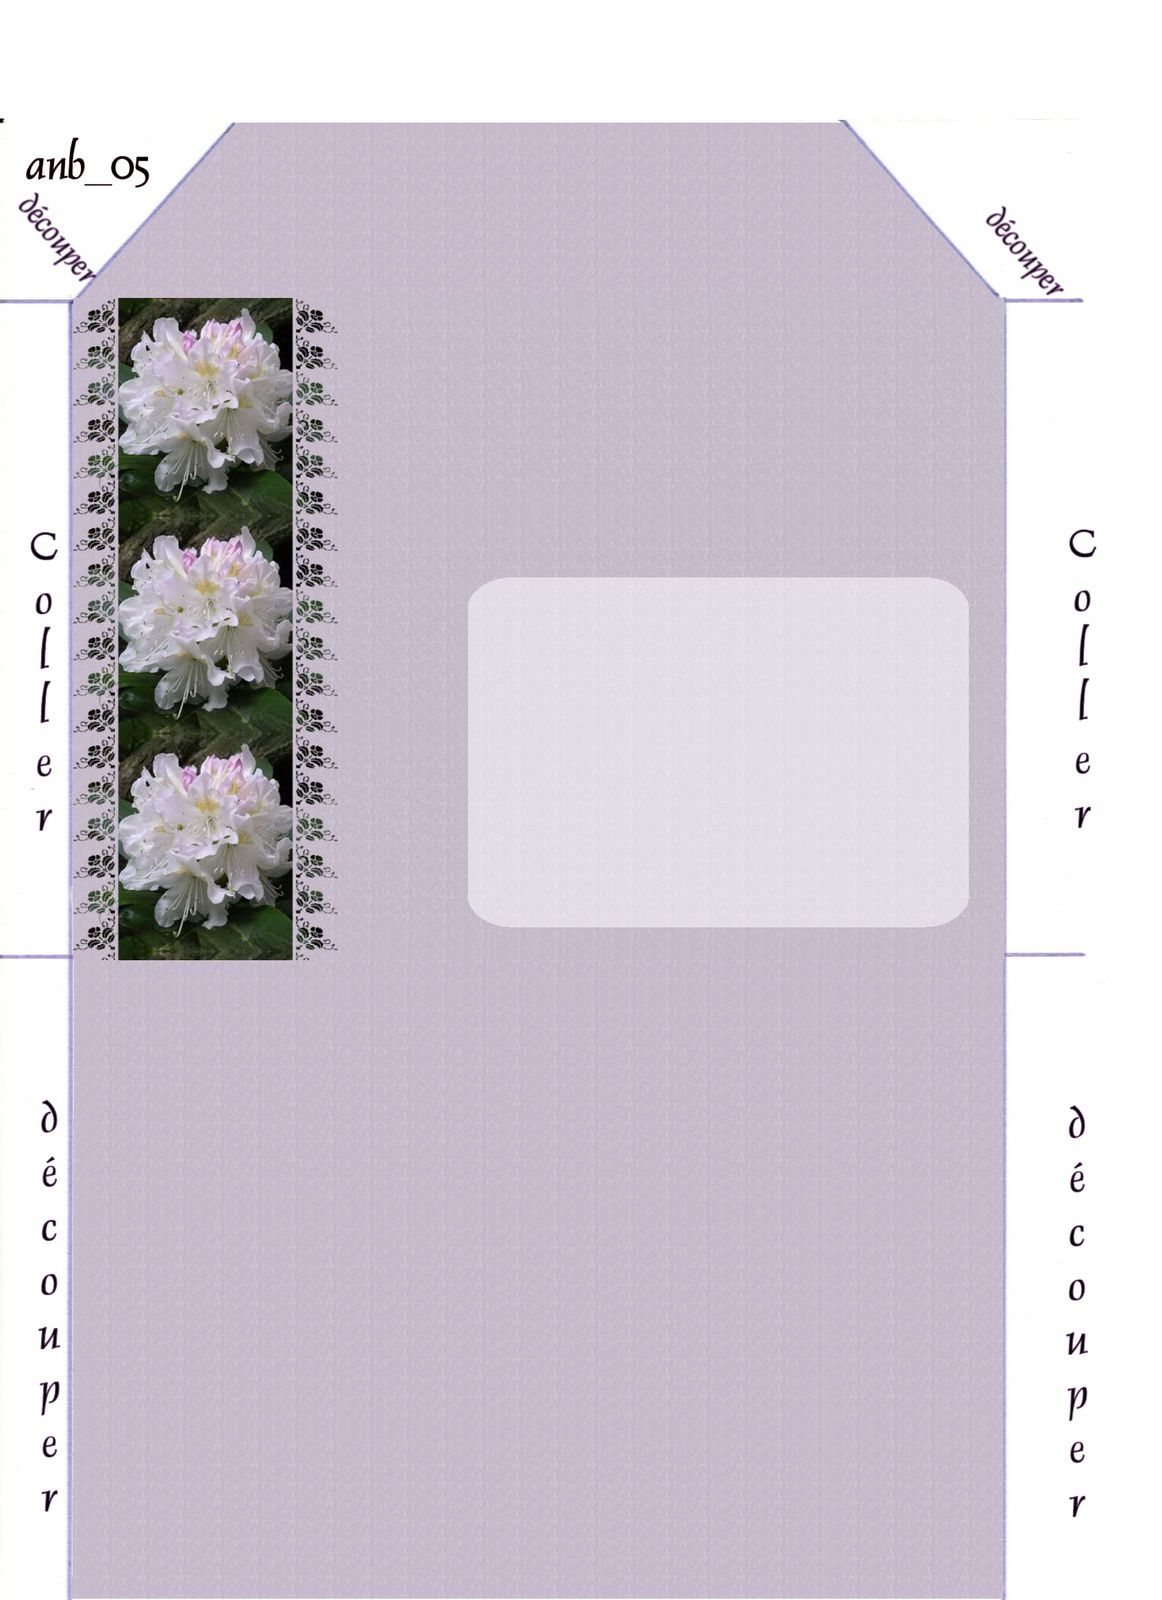 Fleurs Incredimail &amp&#x3B; Papier A4 h l &amp&#x3B; outlook &amp&#x3B; enveloppe &amp&#x3B; 2 cartes A5 &amp&#x3B; signets 3 langues     in_full_bloom